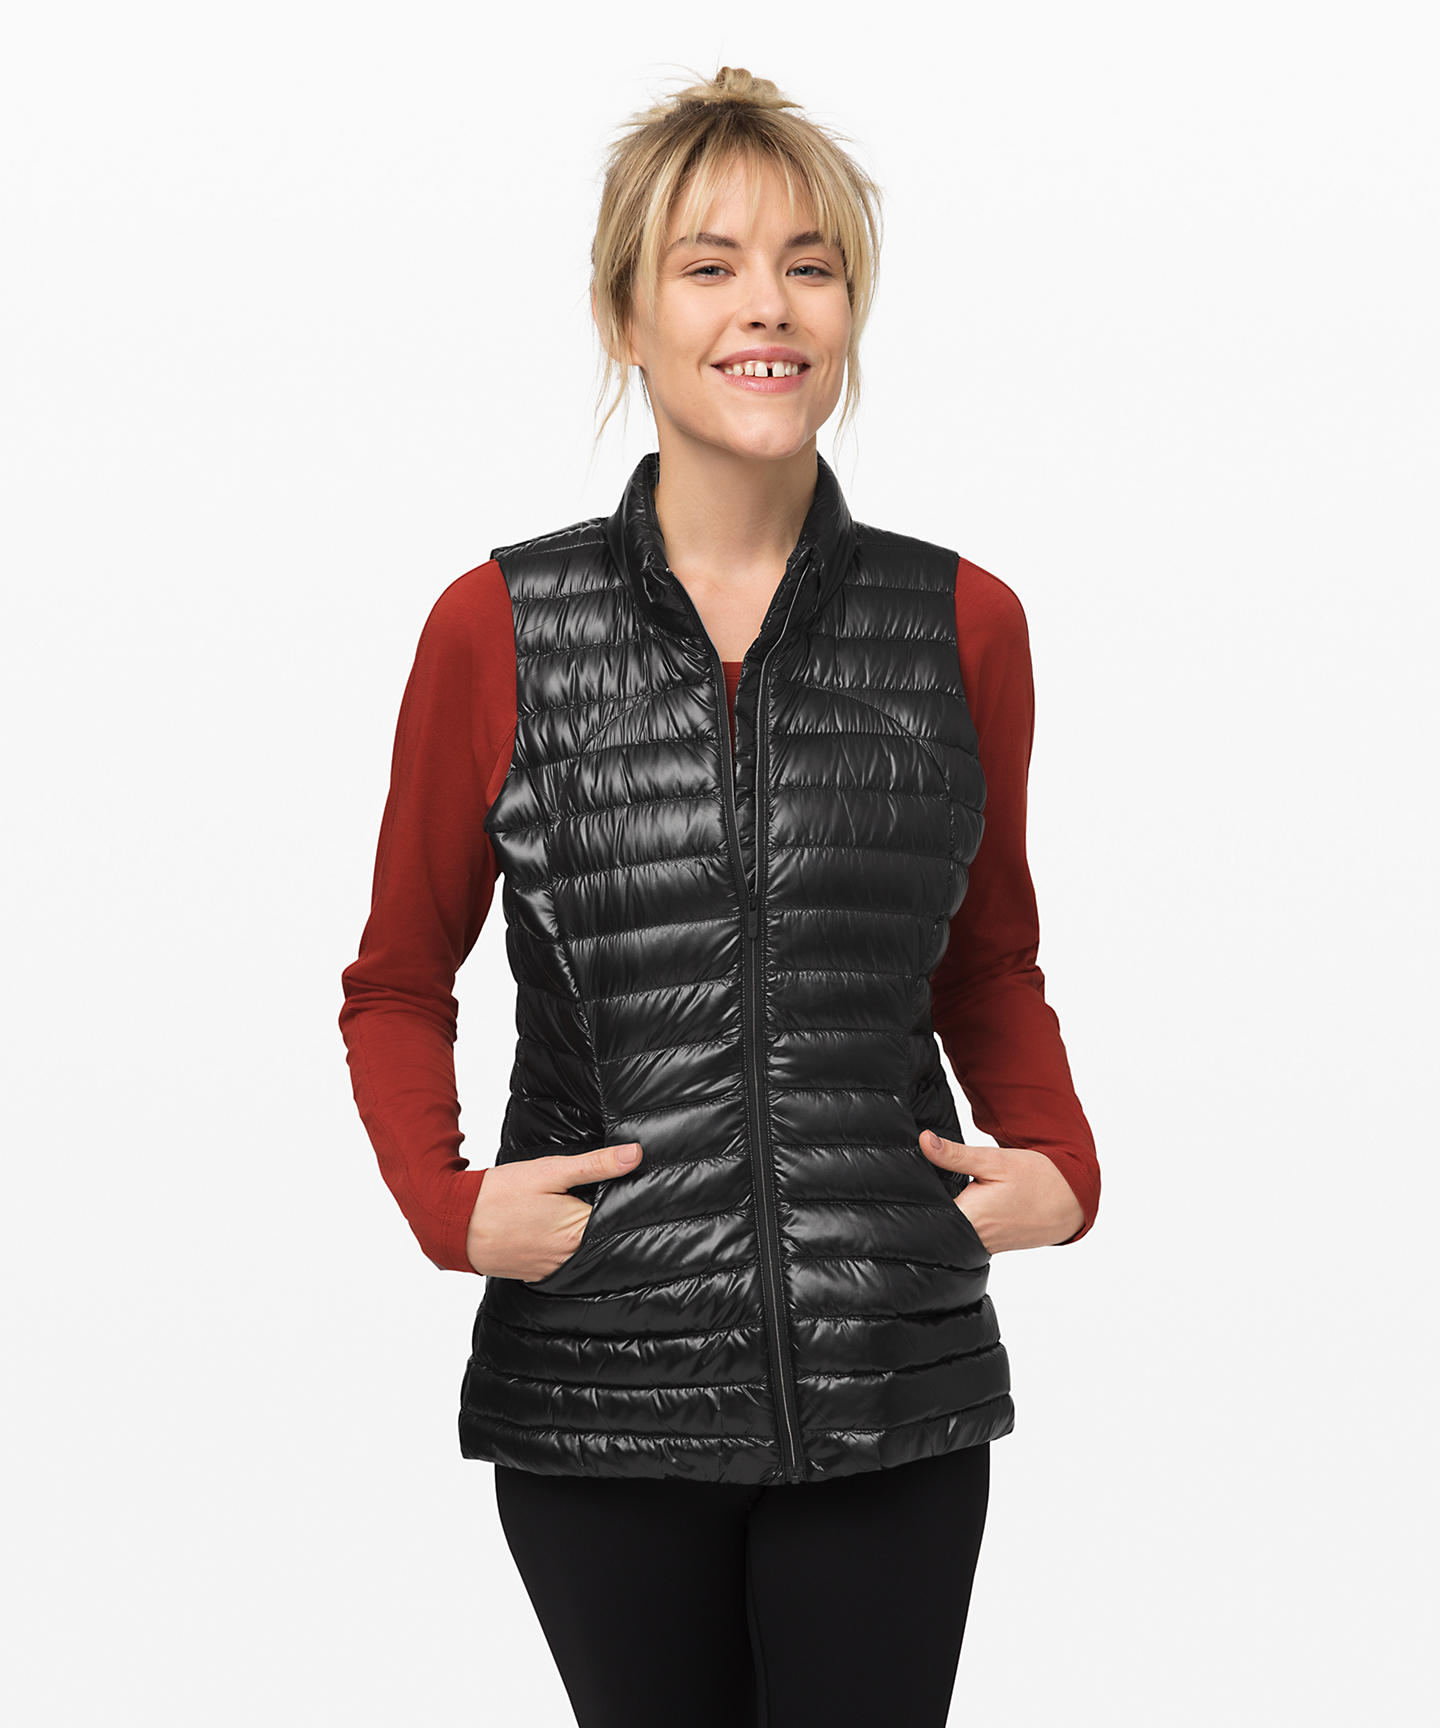 Last Lululemon Upload For 2019, Pack It Down Vest Shine